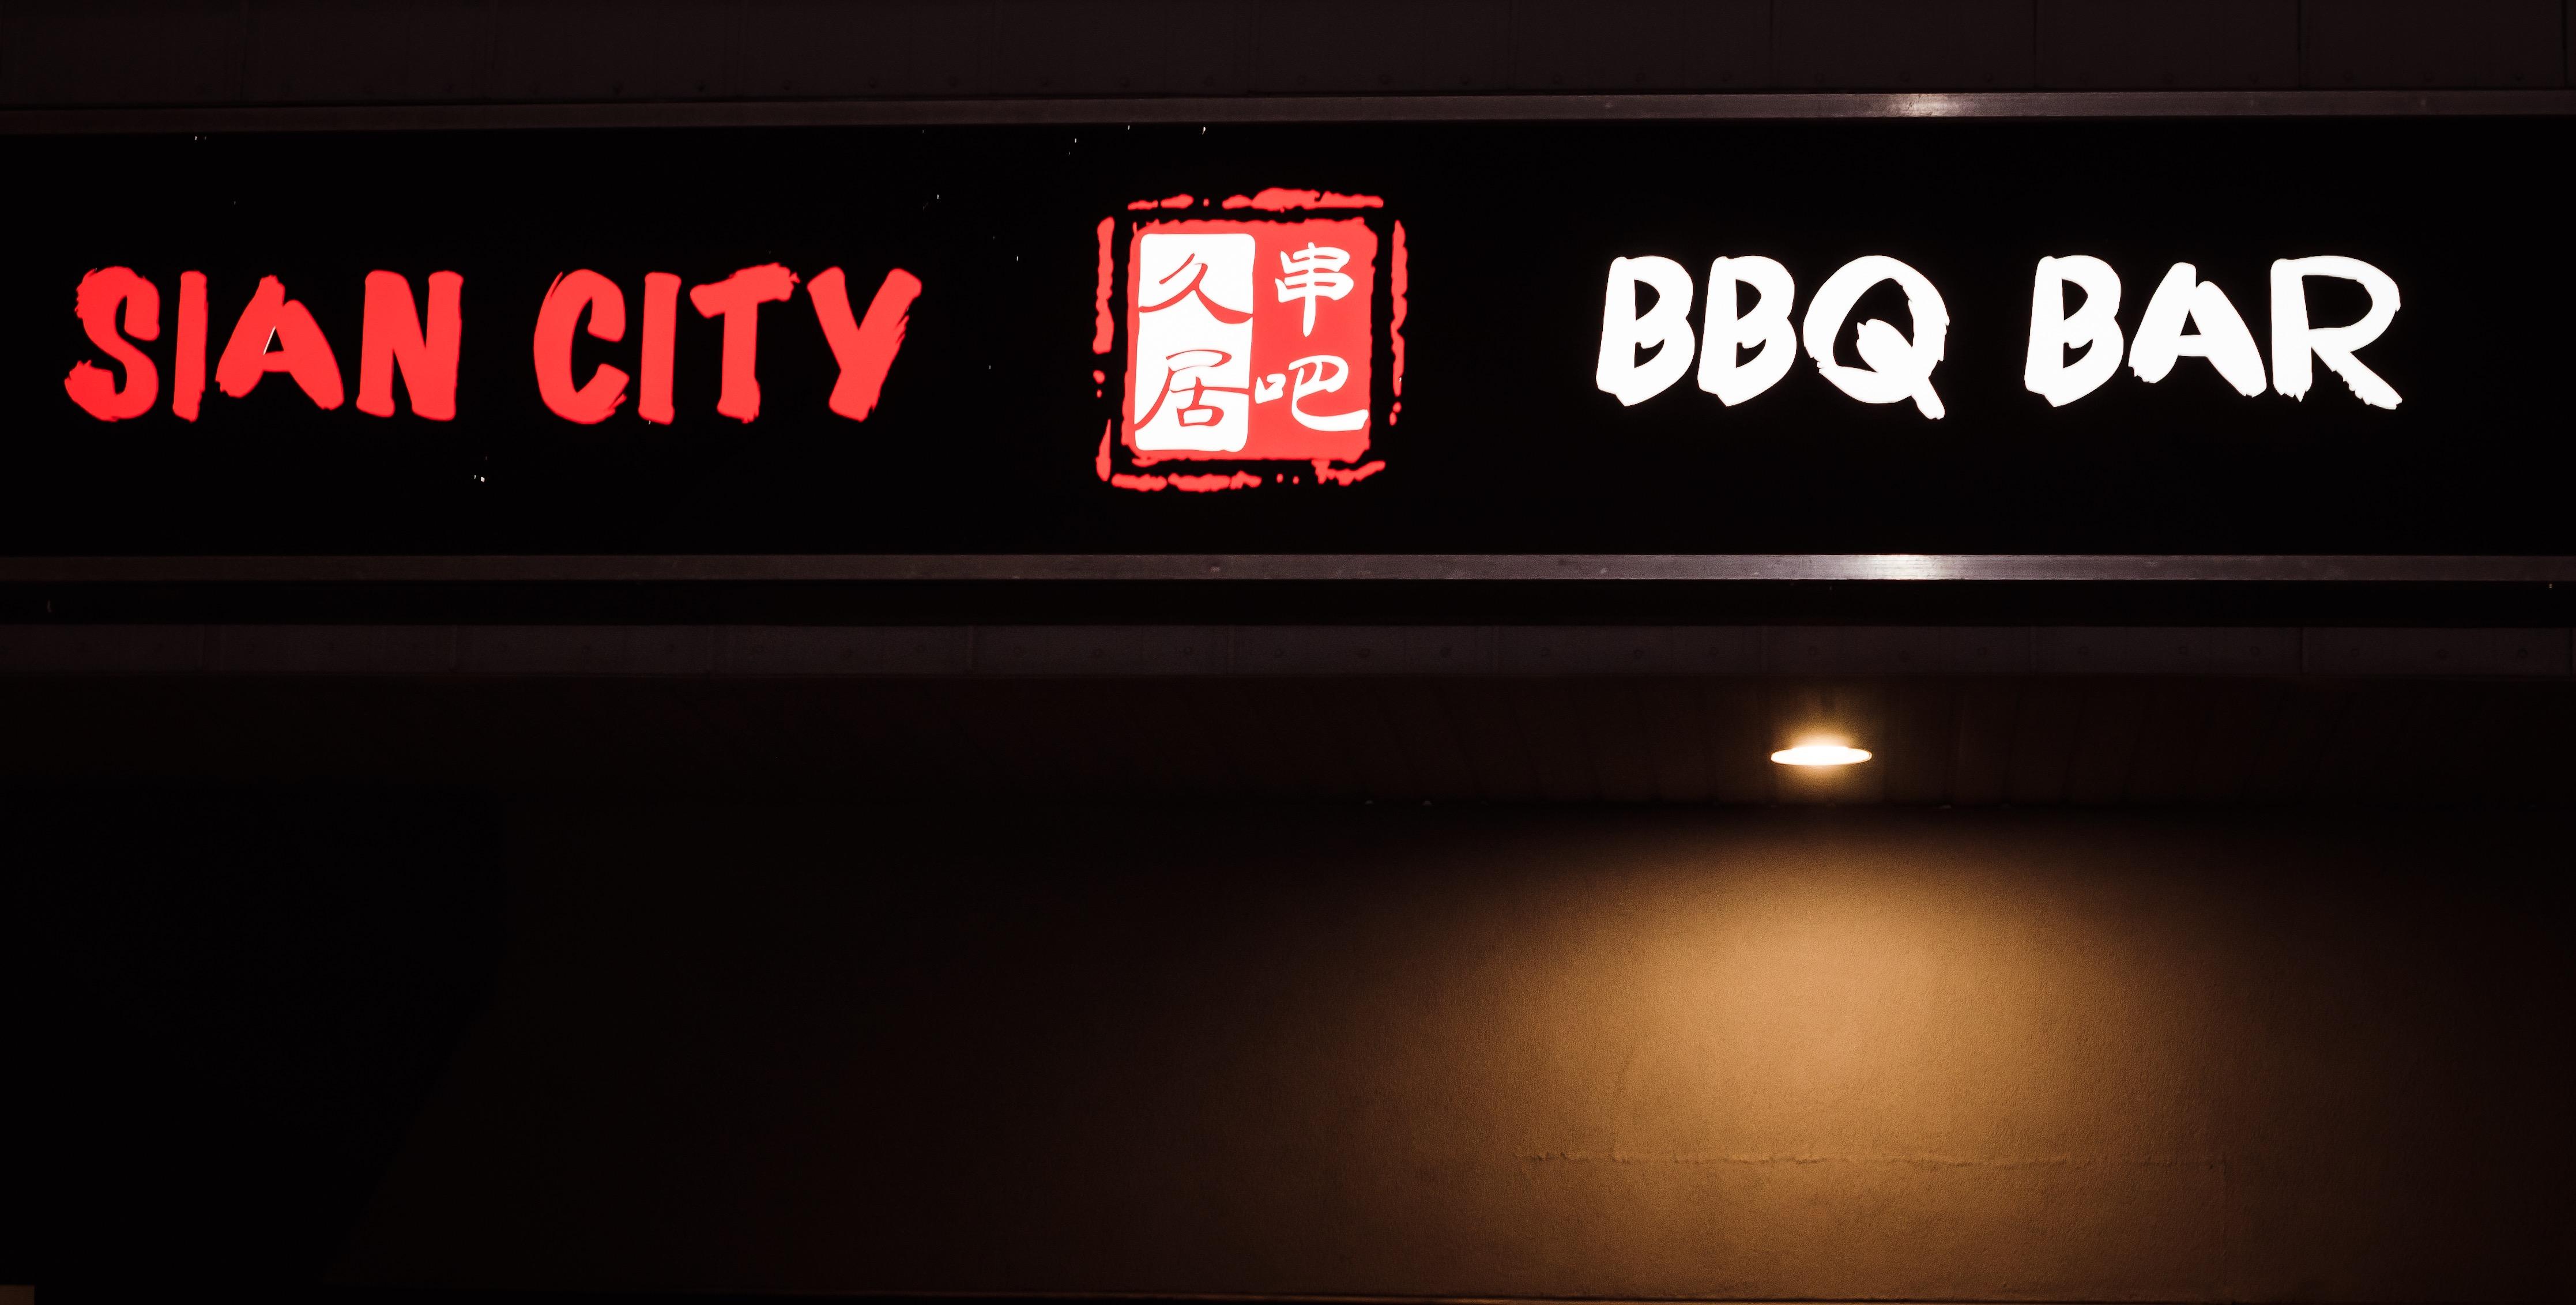 Sian City Restaurant Sign